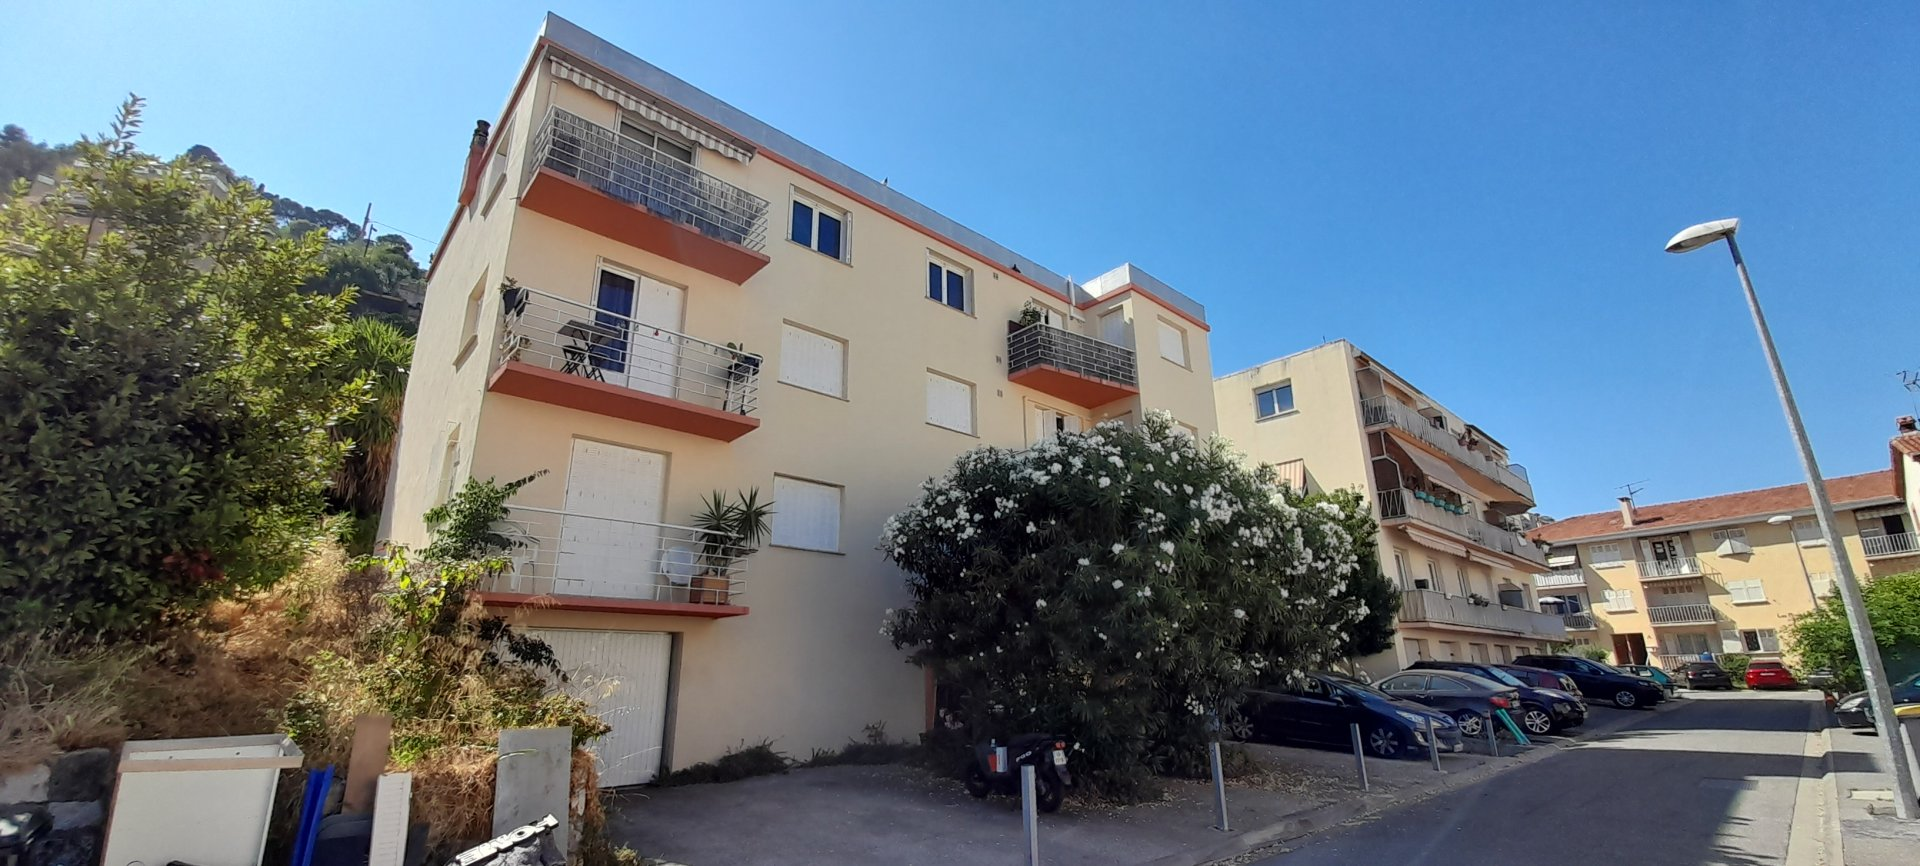 Affitto Appartamento - Nizza (Nice) Saint Sylvestre